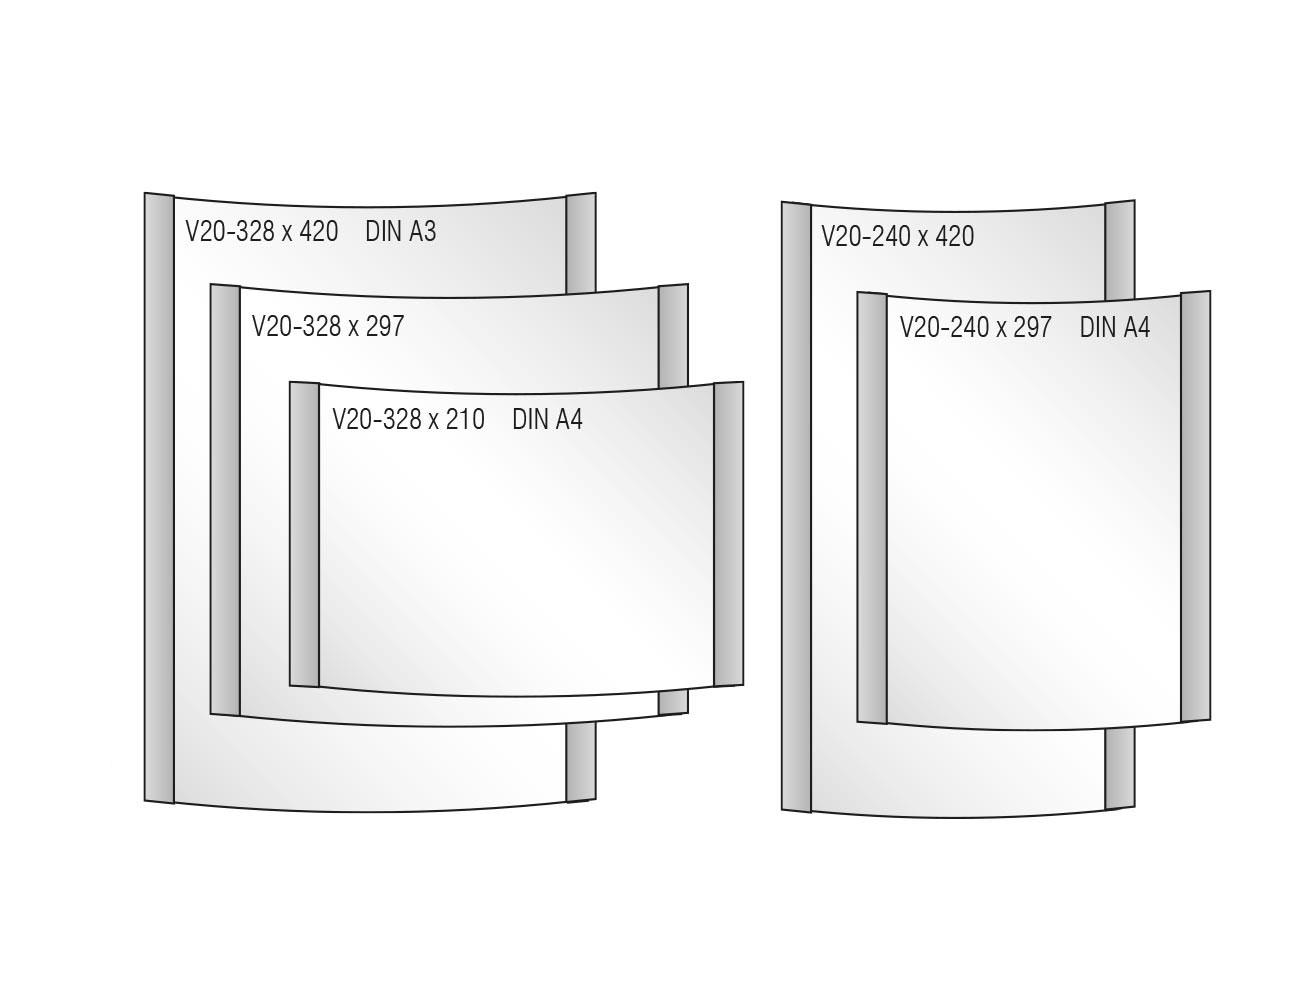 Infoschild VEXO